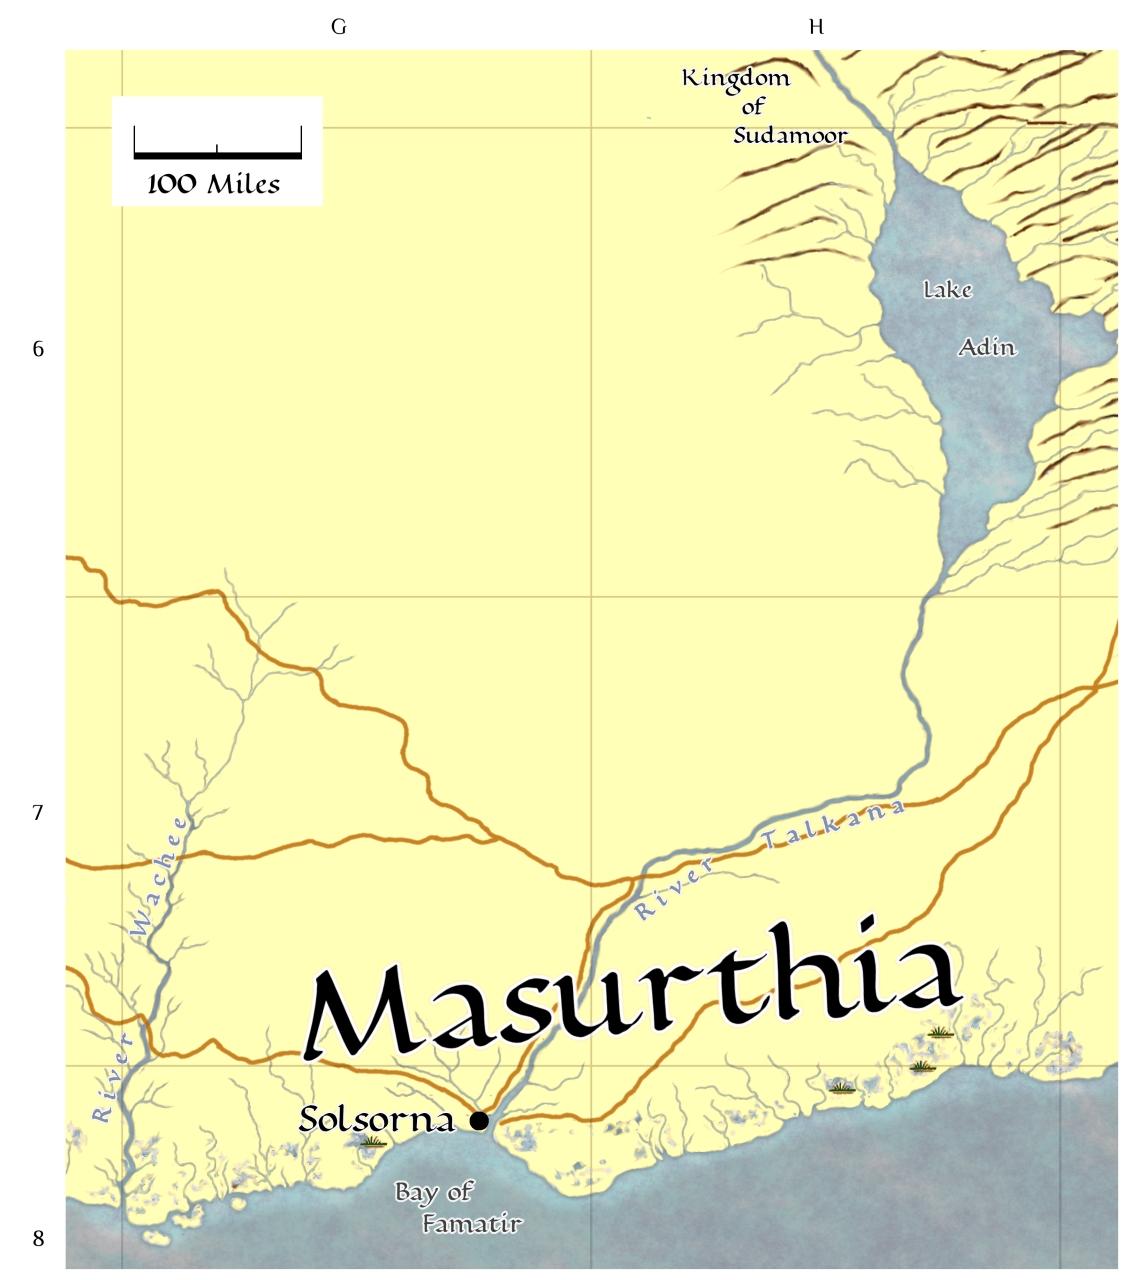 Masurthia map thumbnail